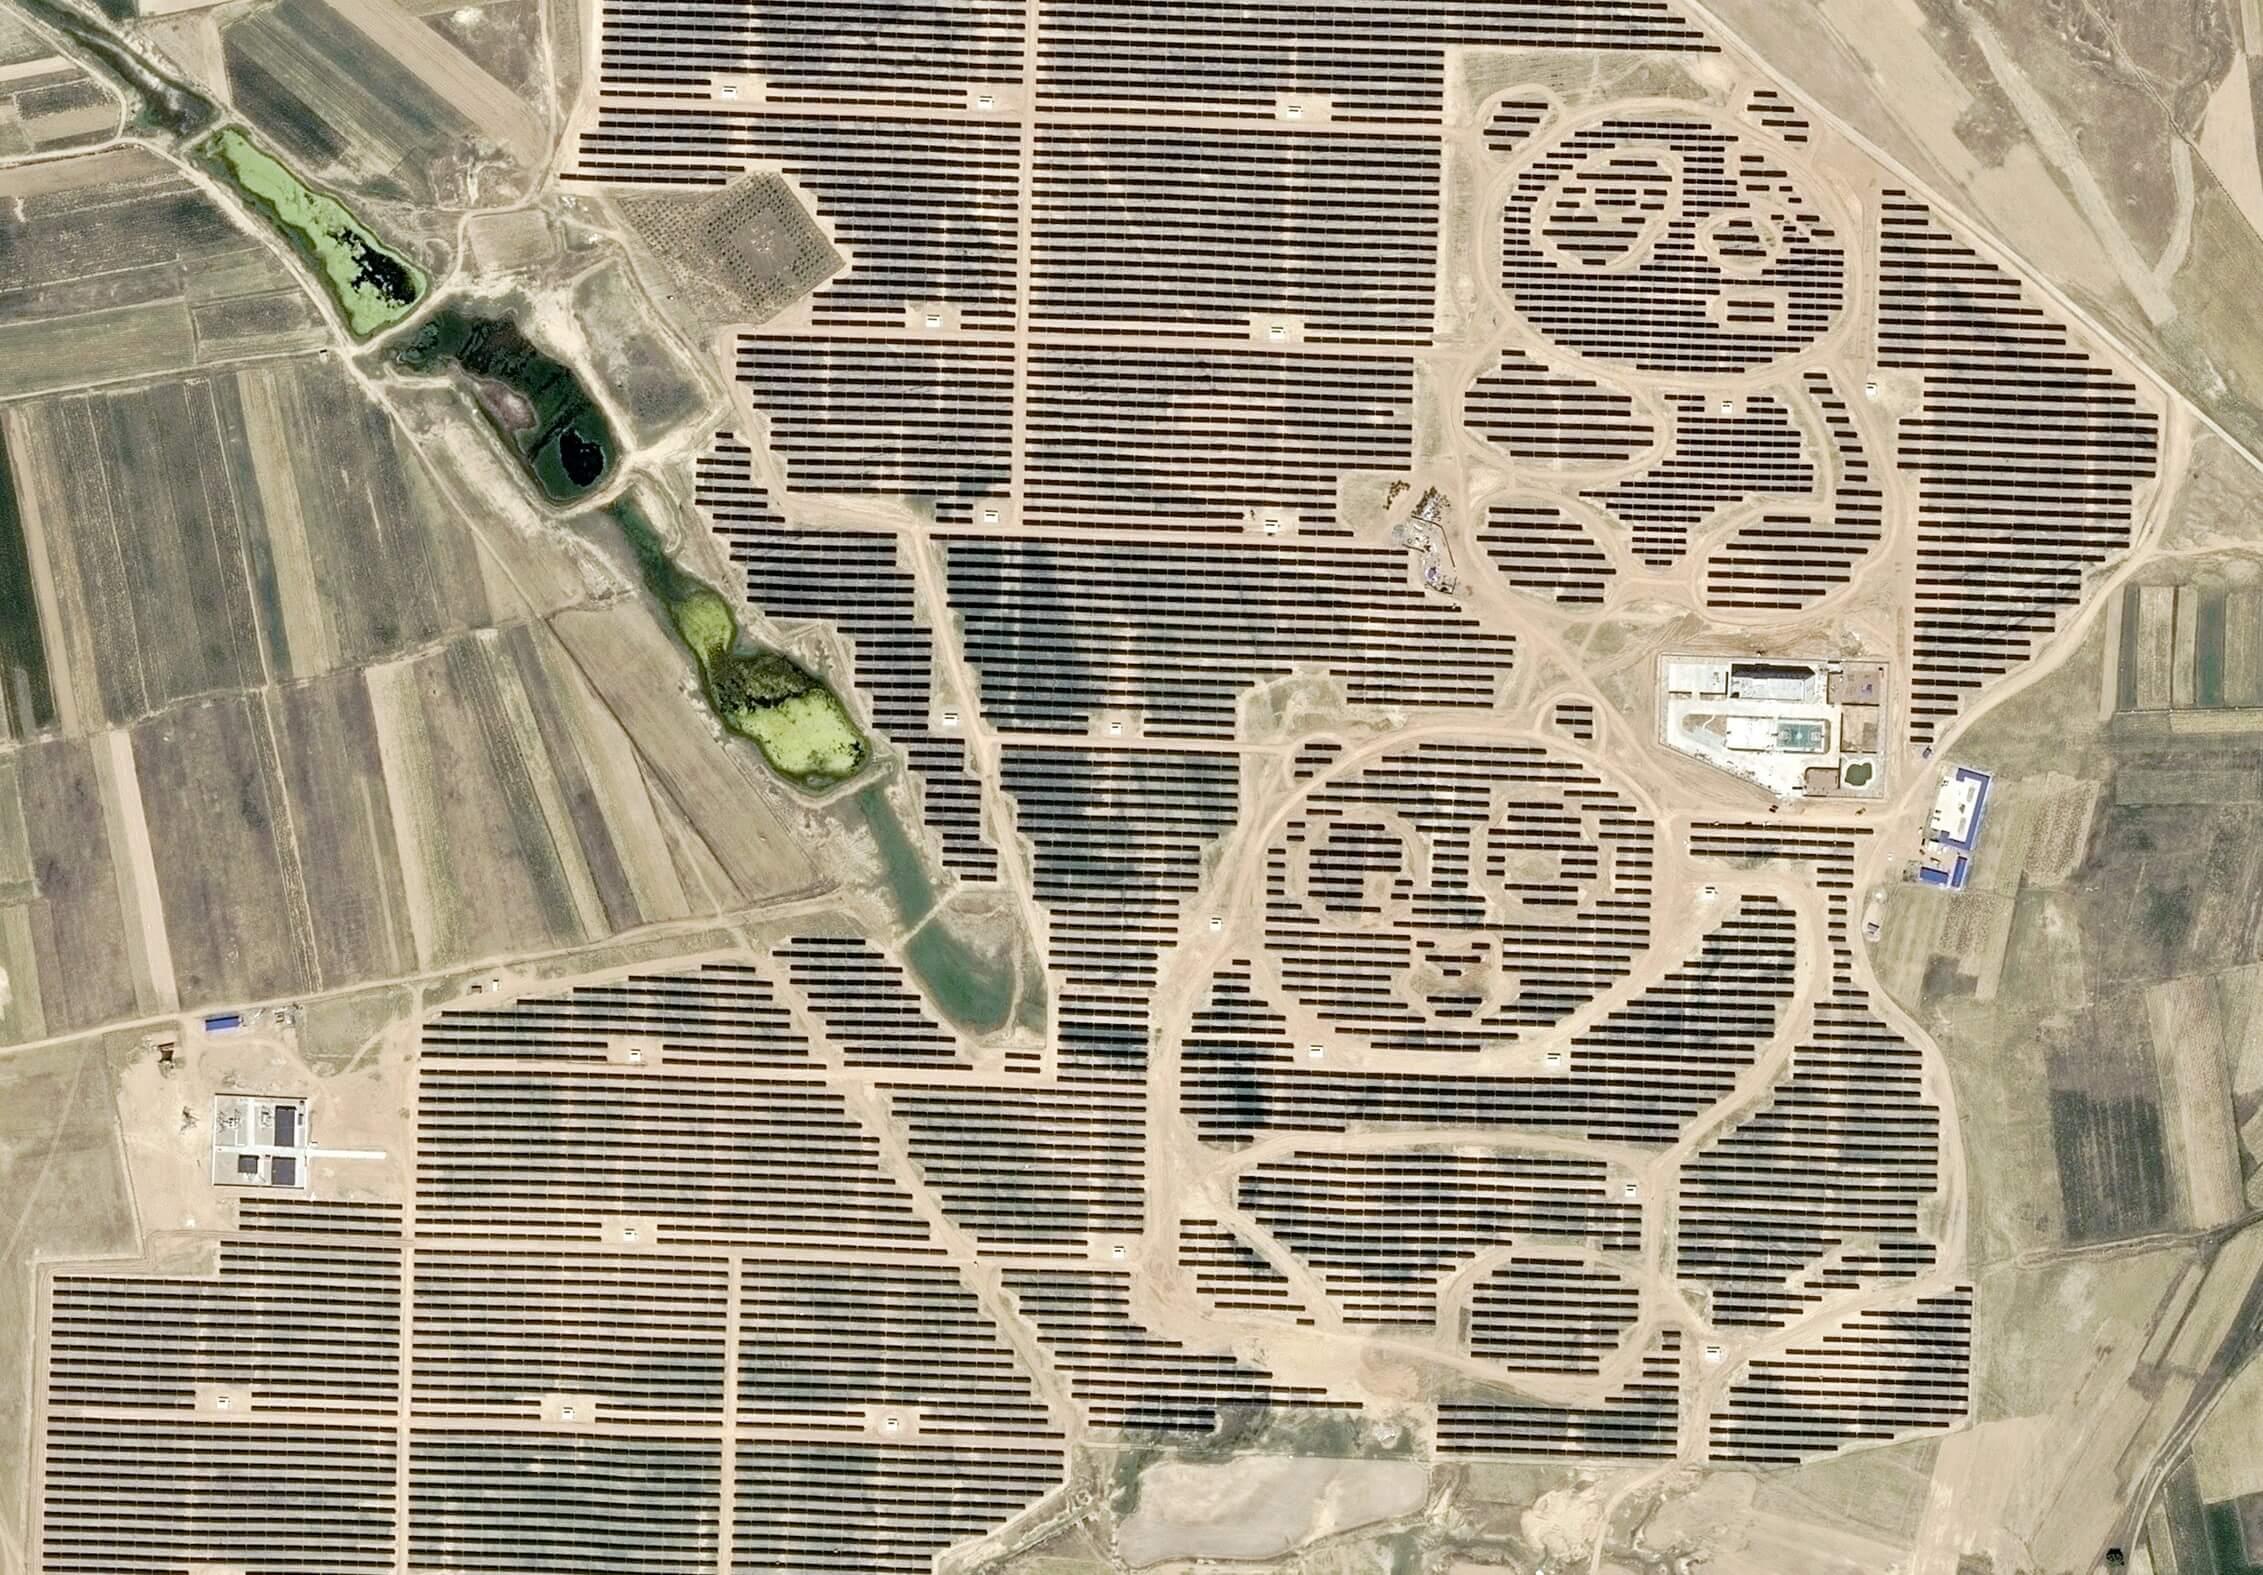 Datong Solar Power Top Runner Base, China